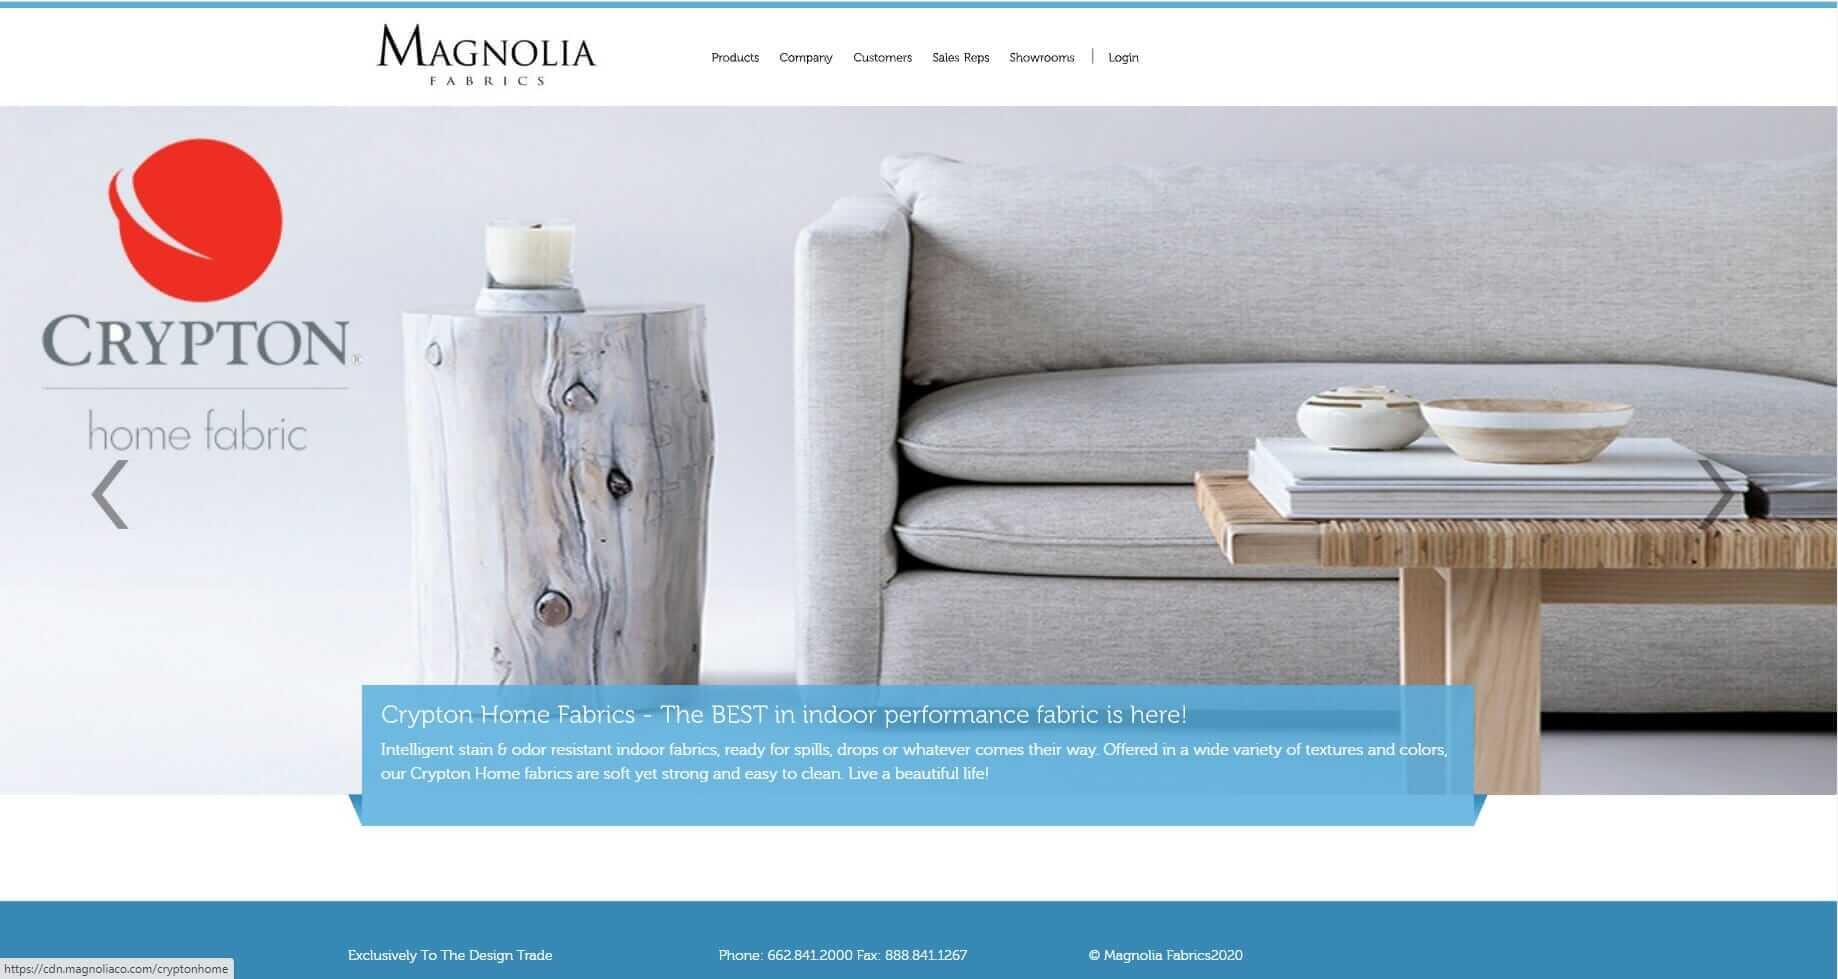 ecommerce Website design for wholesale business - Magnolia Fabrics